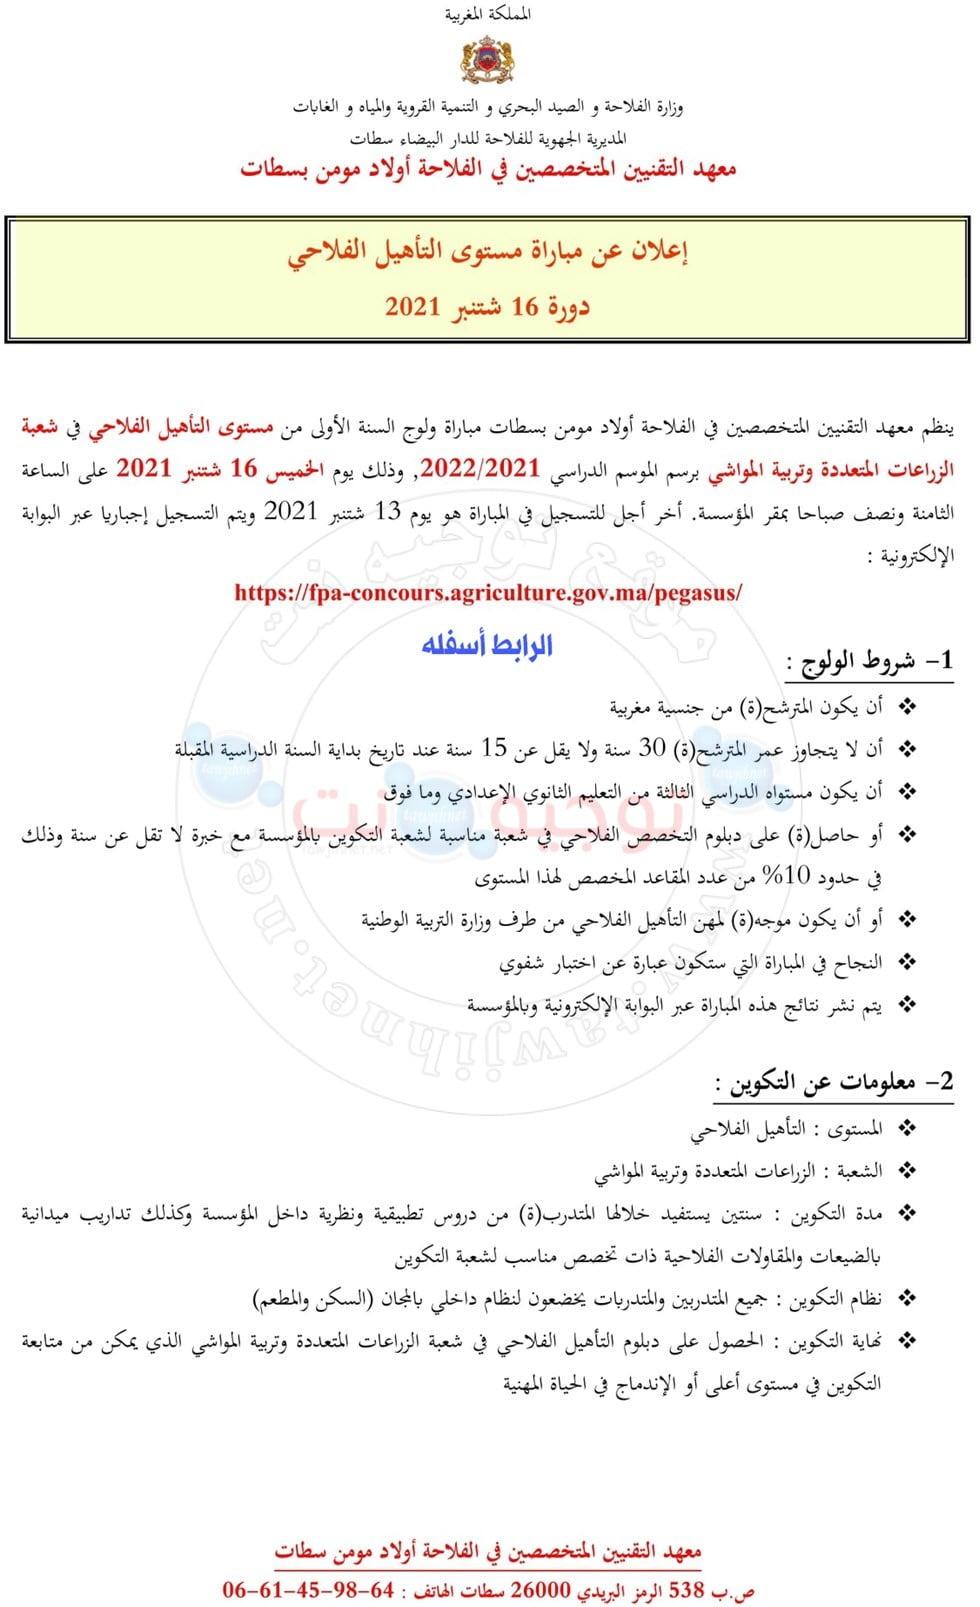 Concours Qualification Ouled Moumen Settat  2021  2022 معهد التقنيين المتخصصين في الفلاحة أولاد مومن بسطات التأهيل